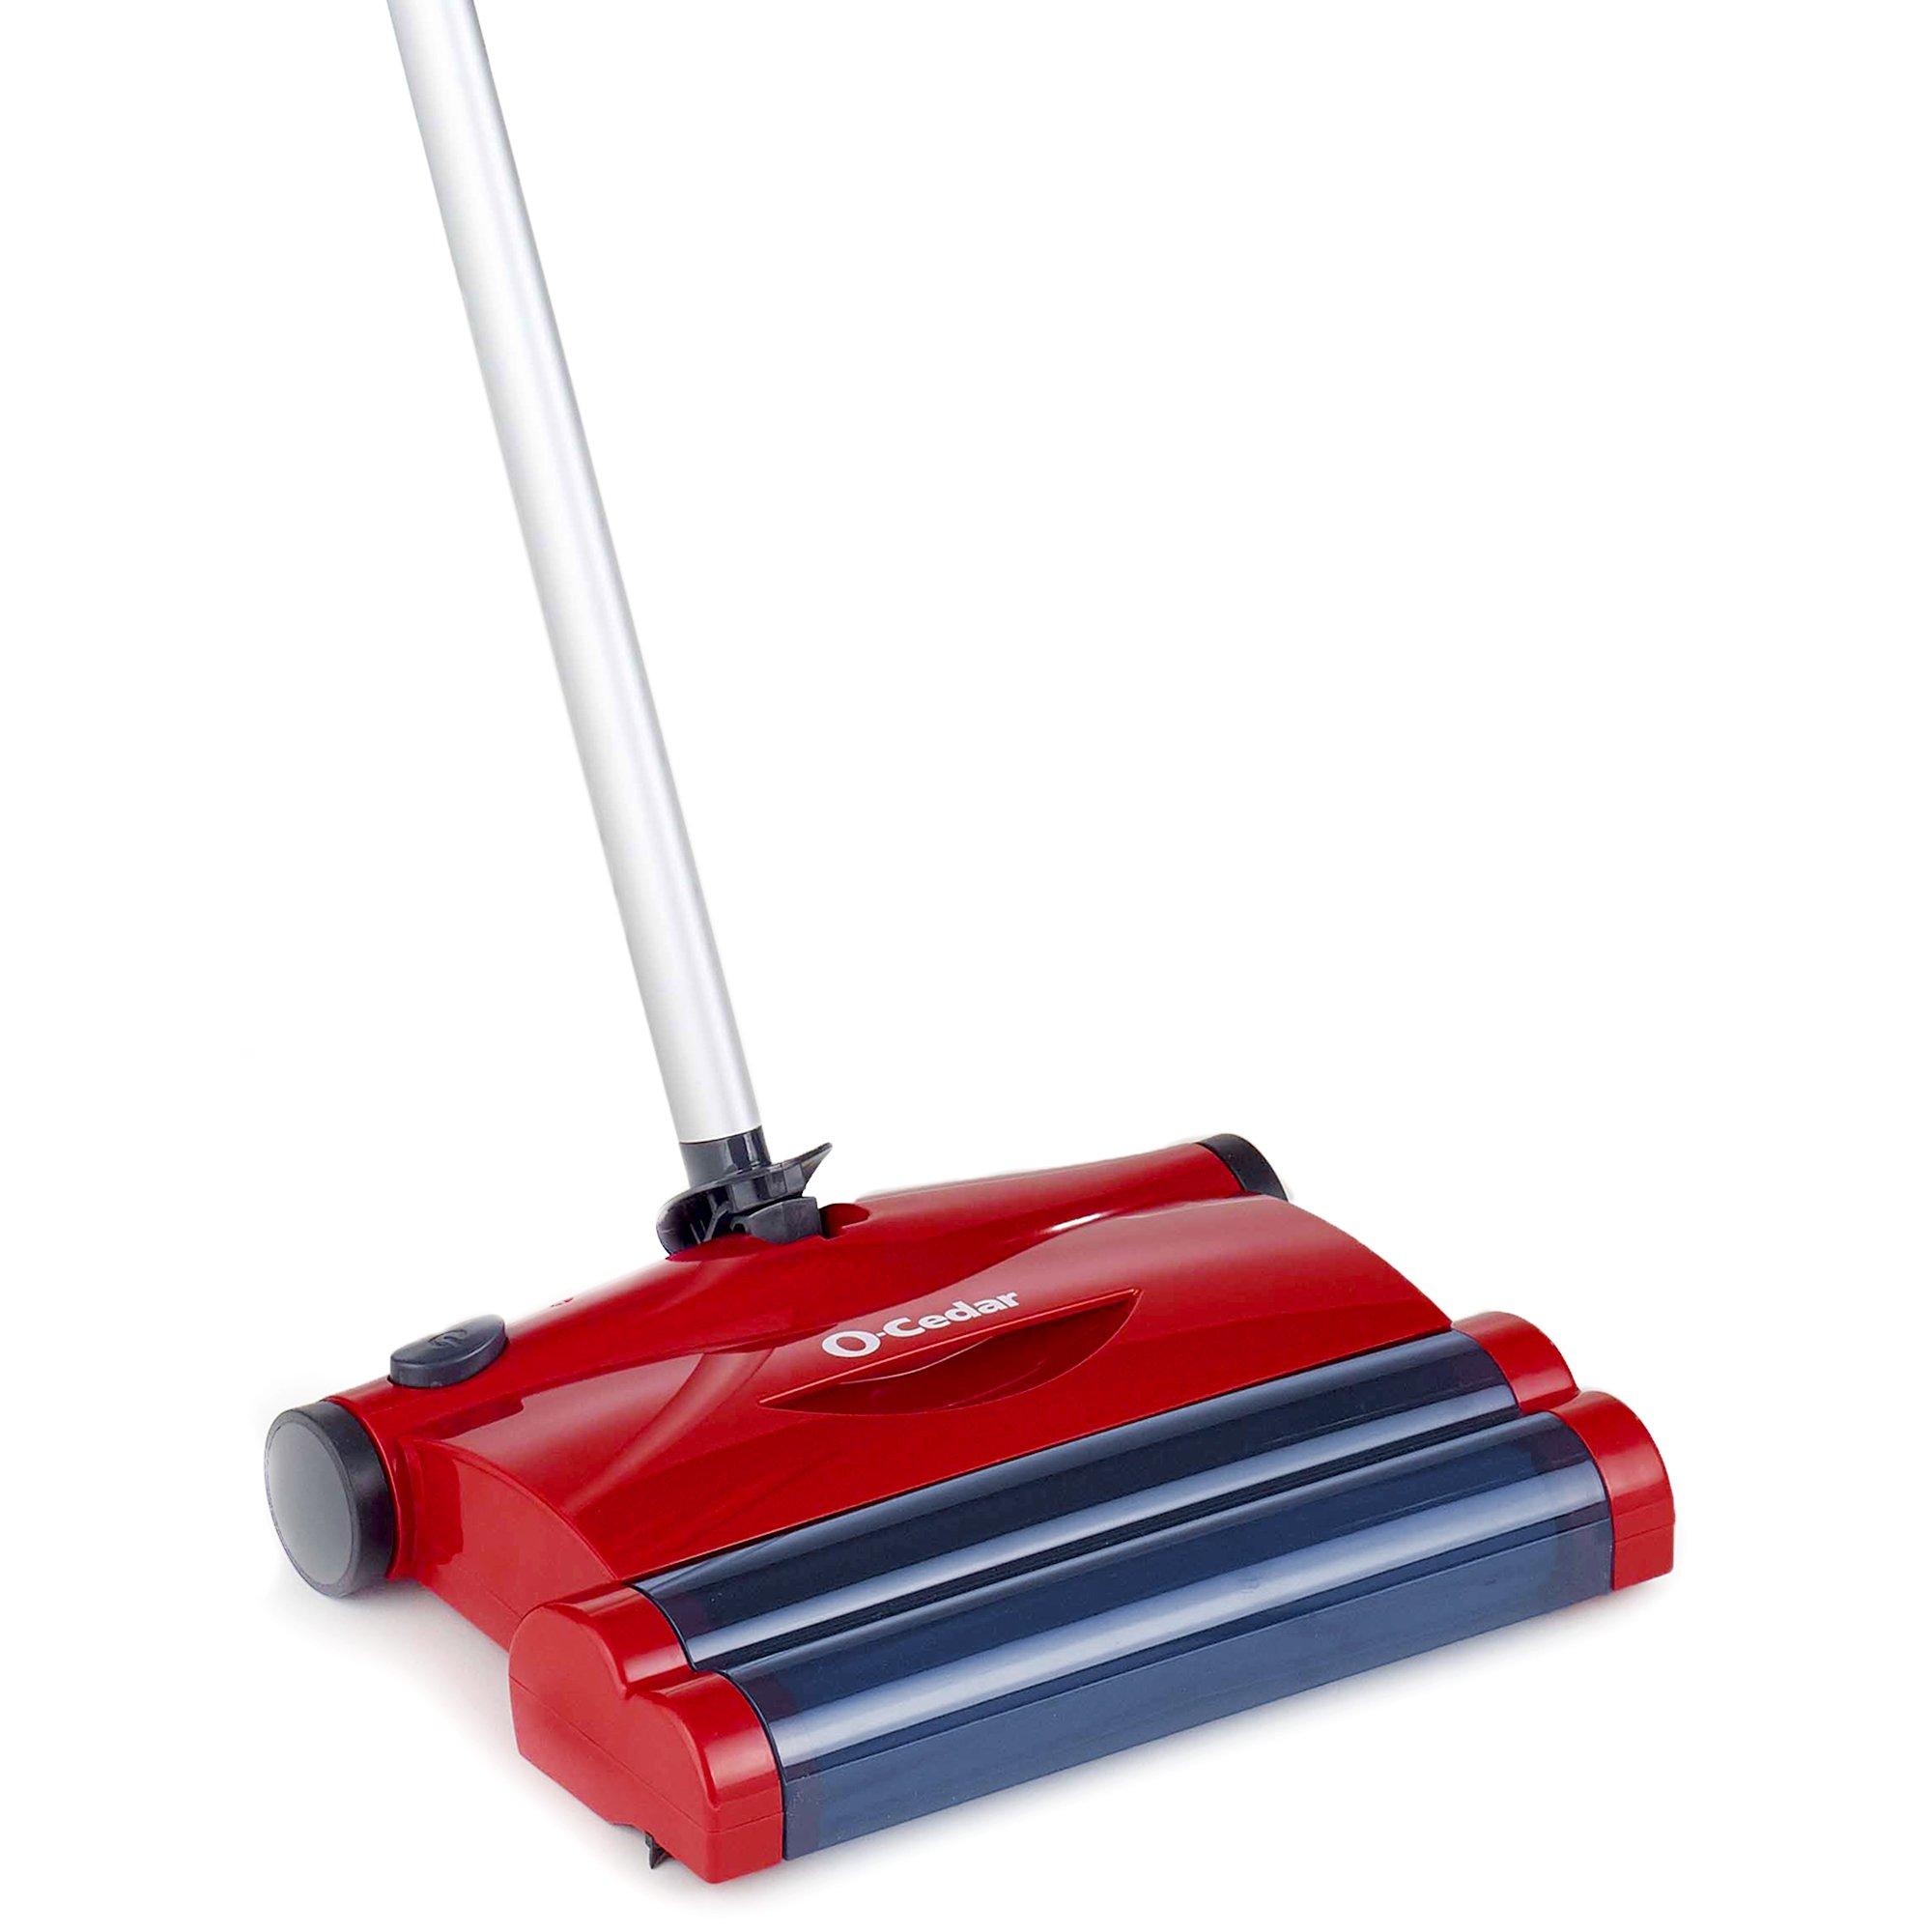 O-Cedar Handy Sweep E-Sweeping Broom